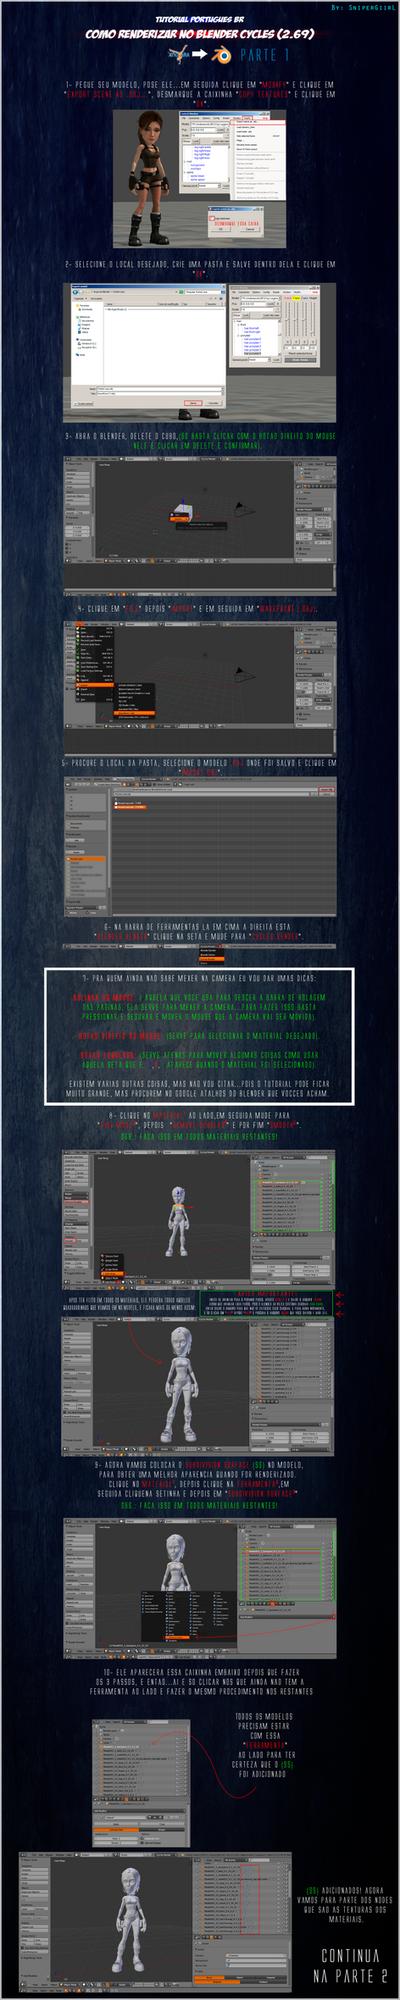 Tutorial Xnalara - Blender Cycles [PT-BR] Parte 1 by SniperGiirl